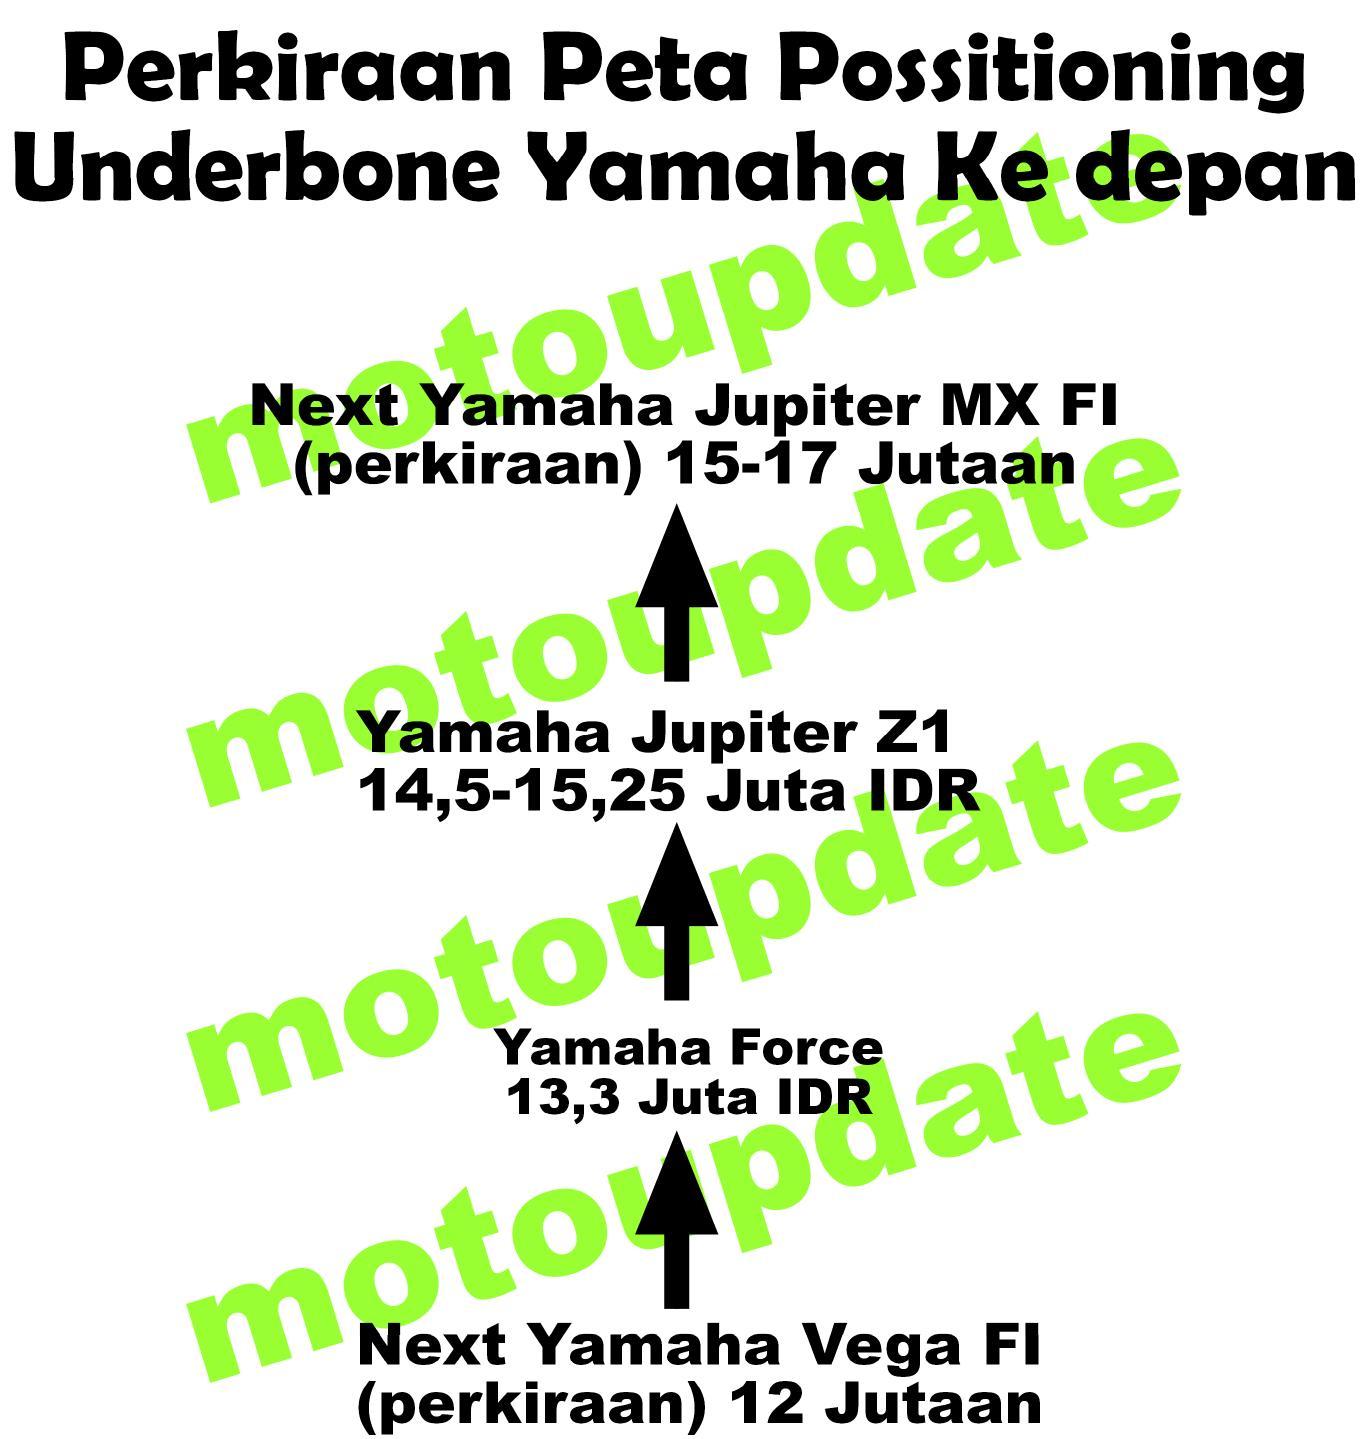 roadmap_underbone_yamaha